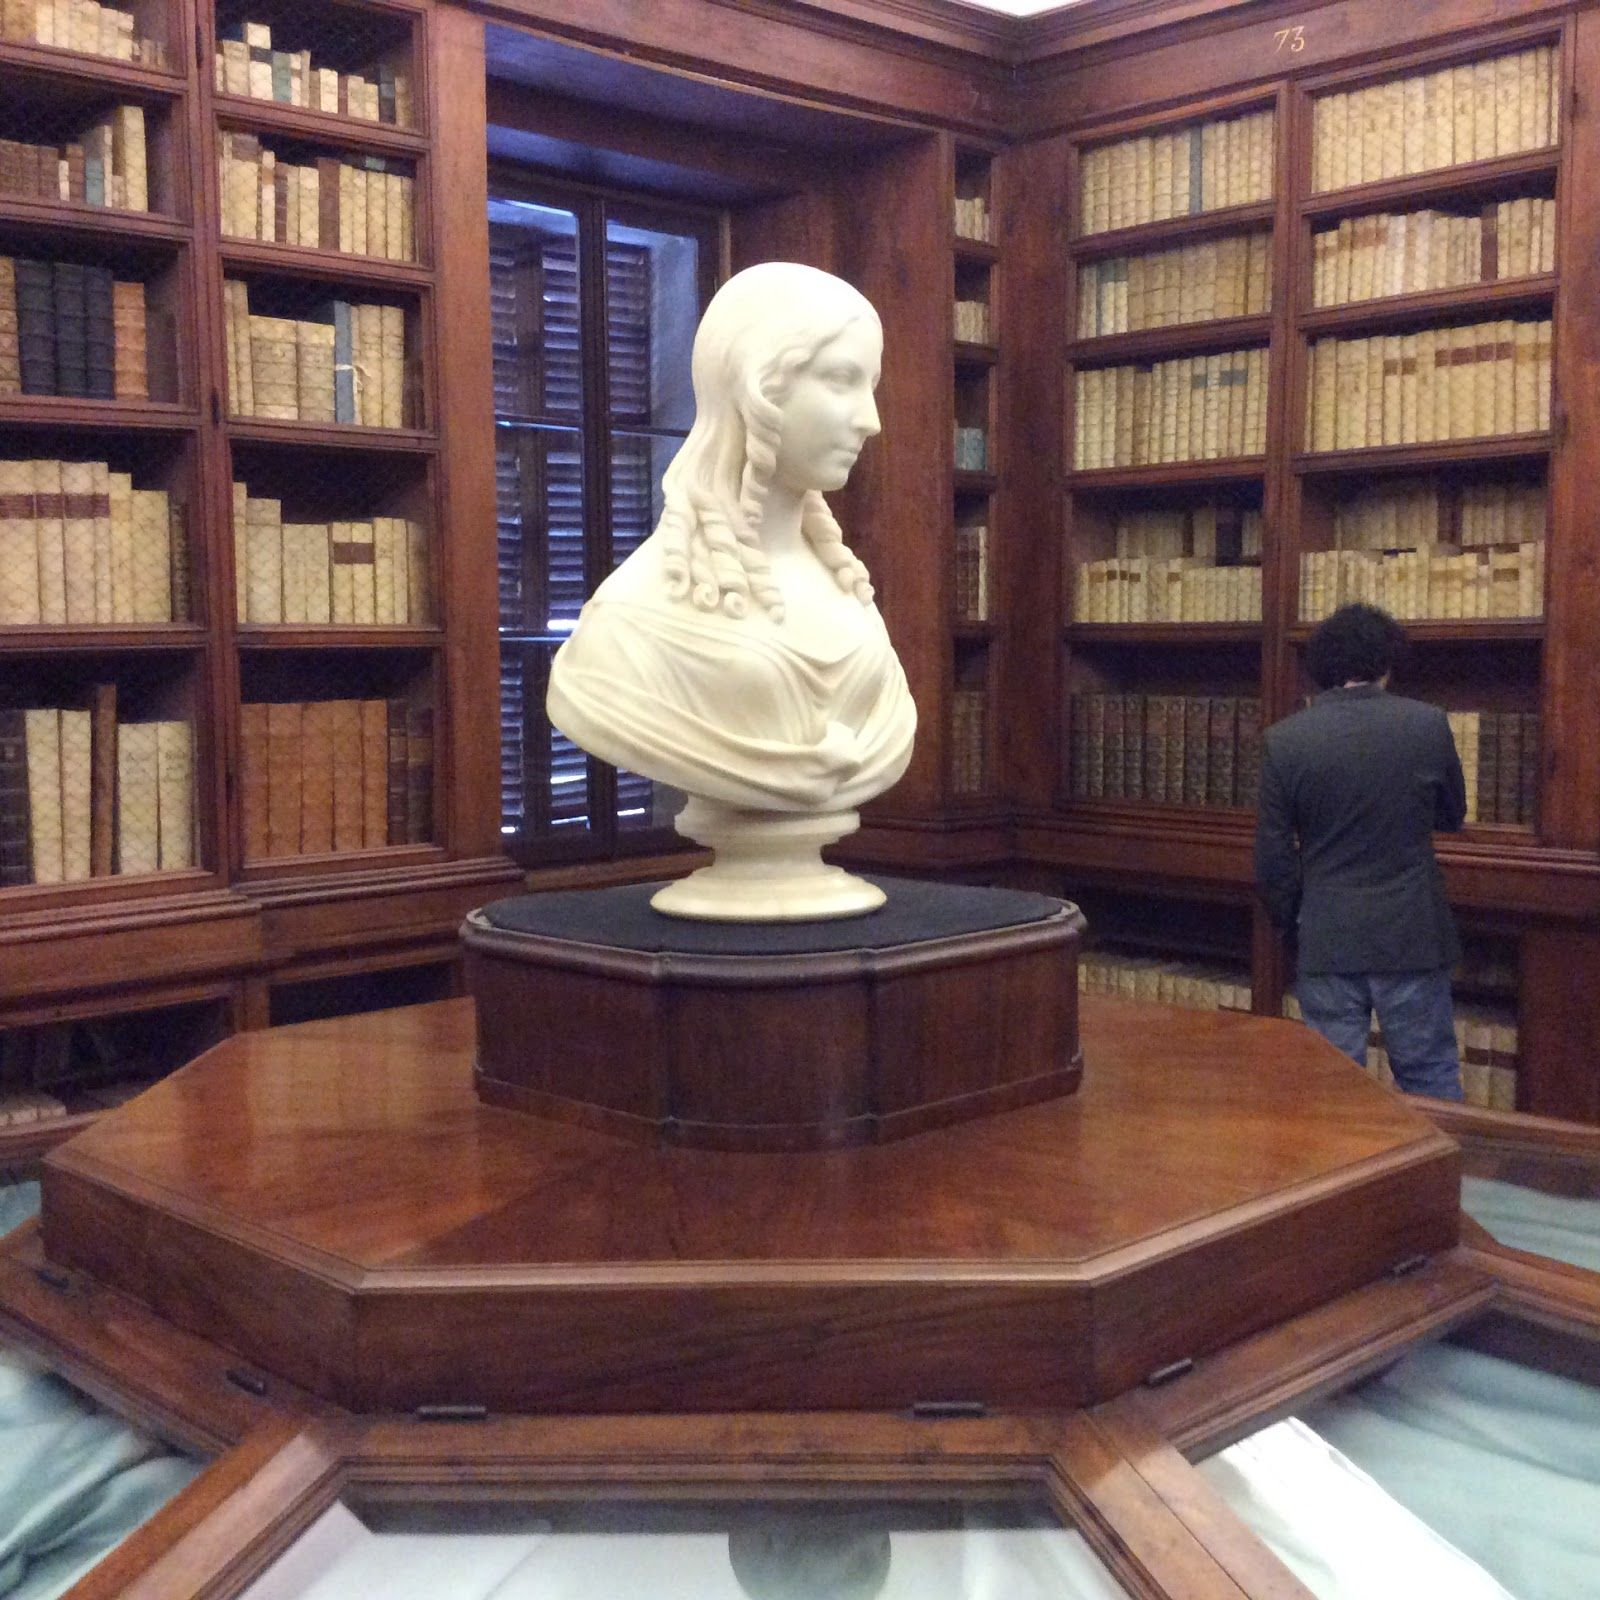 Strada Facendo Visita Guidata Alla Biblioteca Classense Ravenna